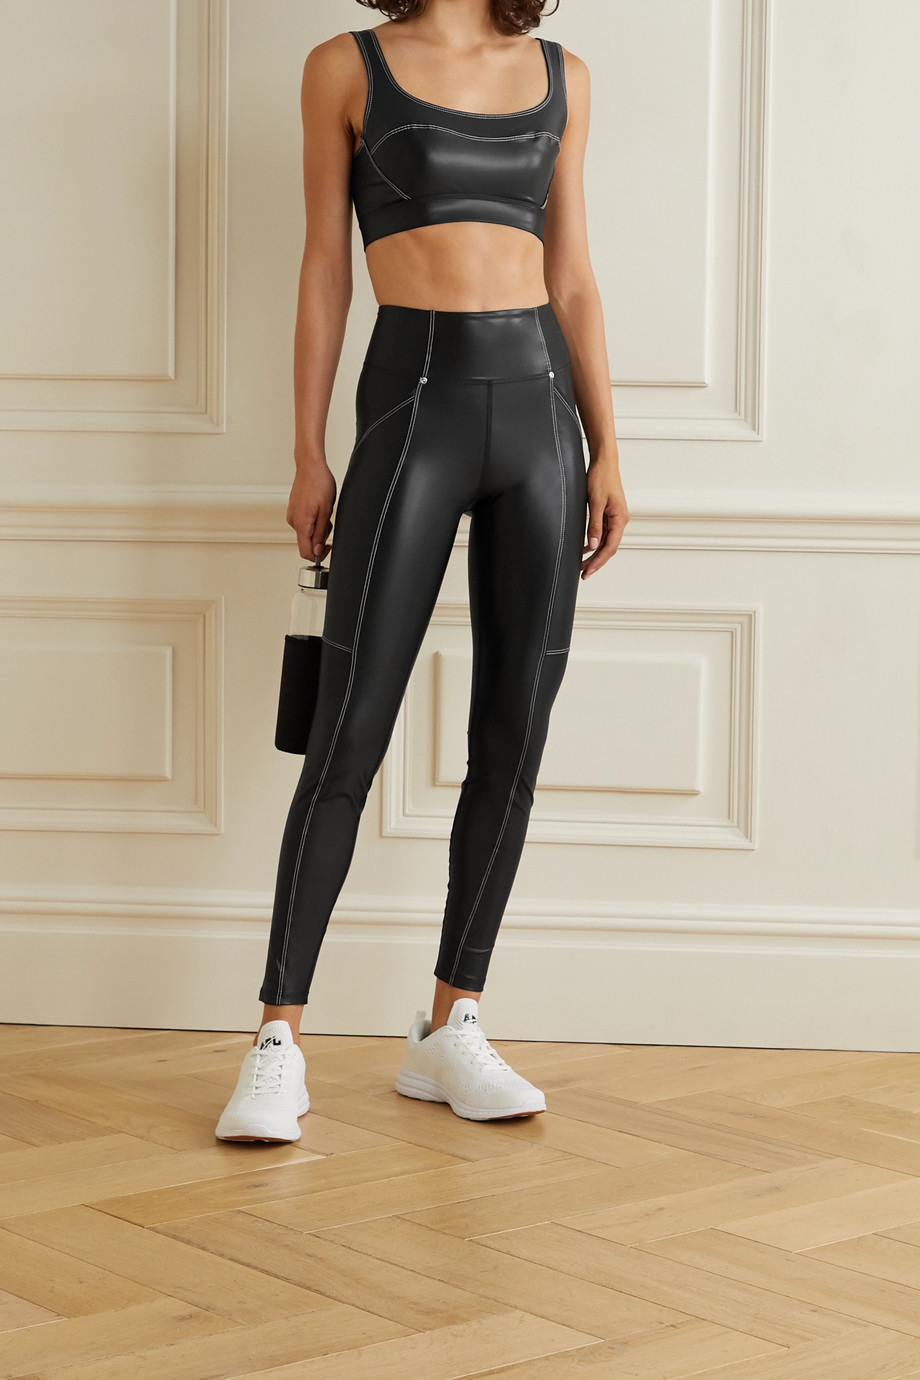 Heroine Sport Allure coated stretch leggings